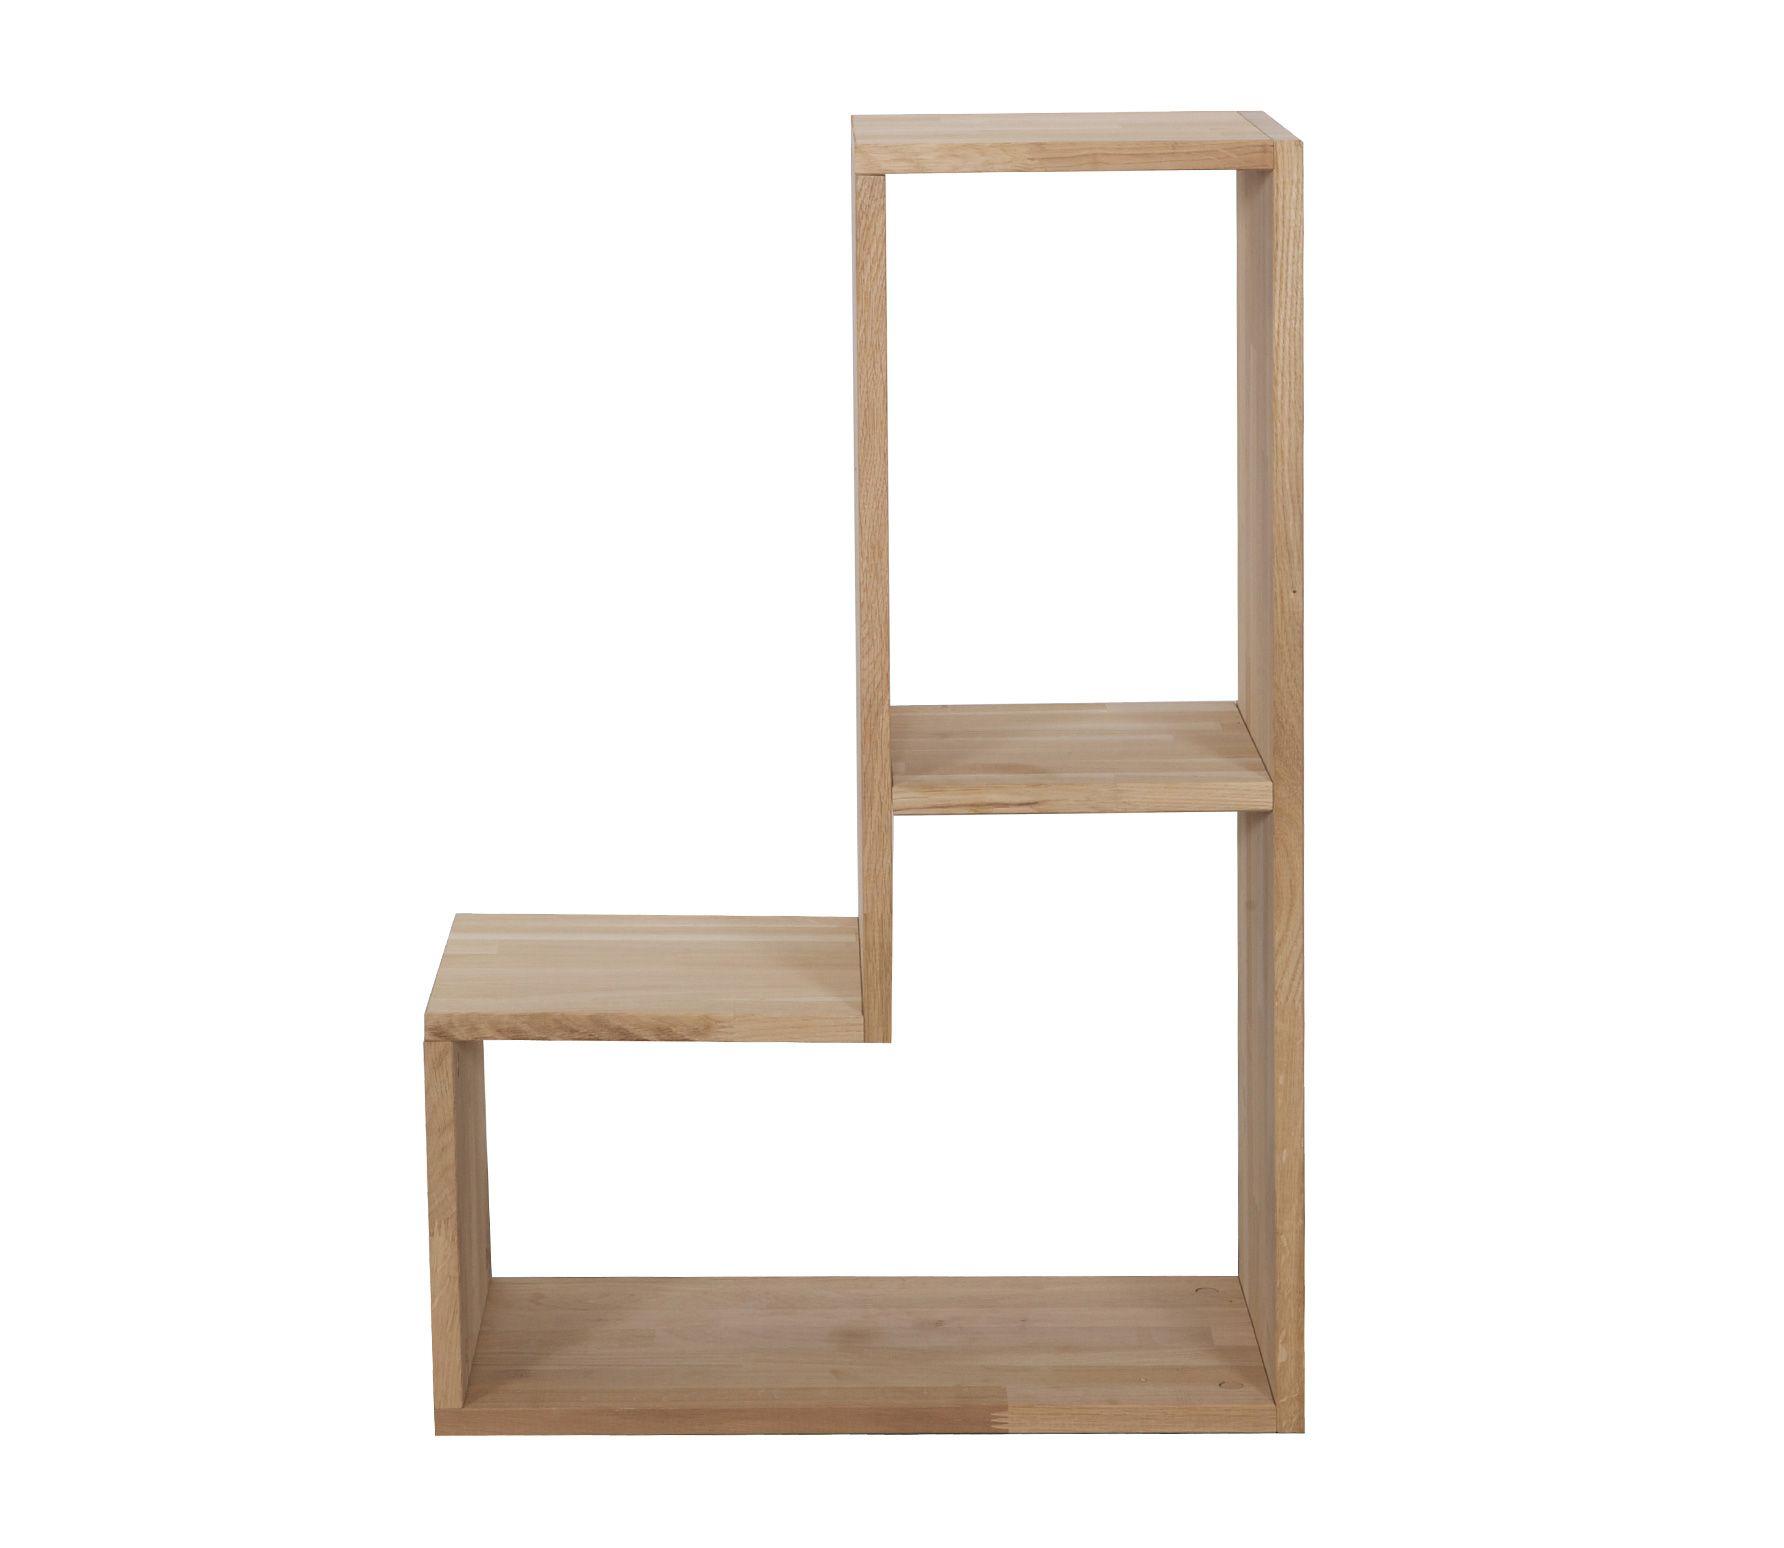 Woood Tetris Losse Set T.b.v. Stapelkast Eiken   1 Elementenset Eiken Amazing Ideas